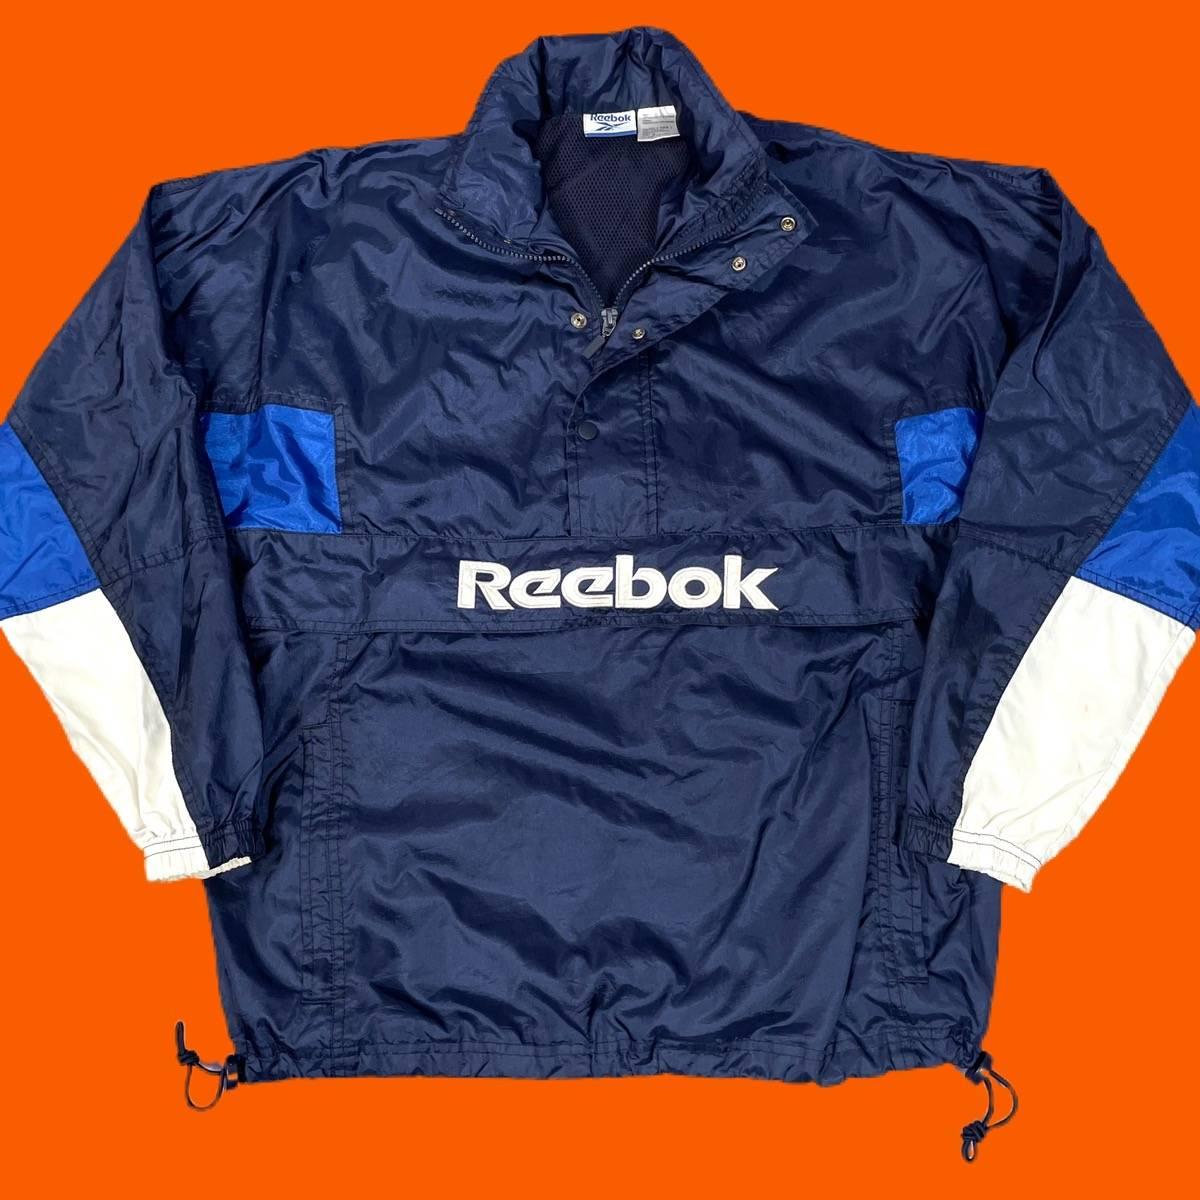 vintage 80s 90s windbreaker Reebok jacket  black with pin stripes down sleeve and front oversized windbreaker track jacket 90s clothing